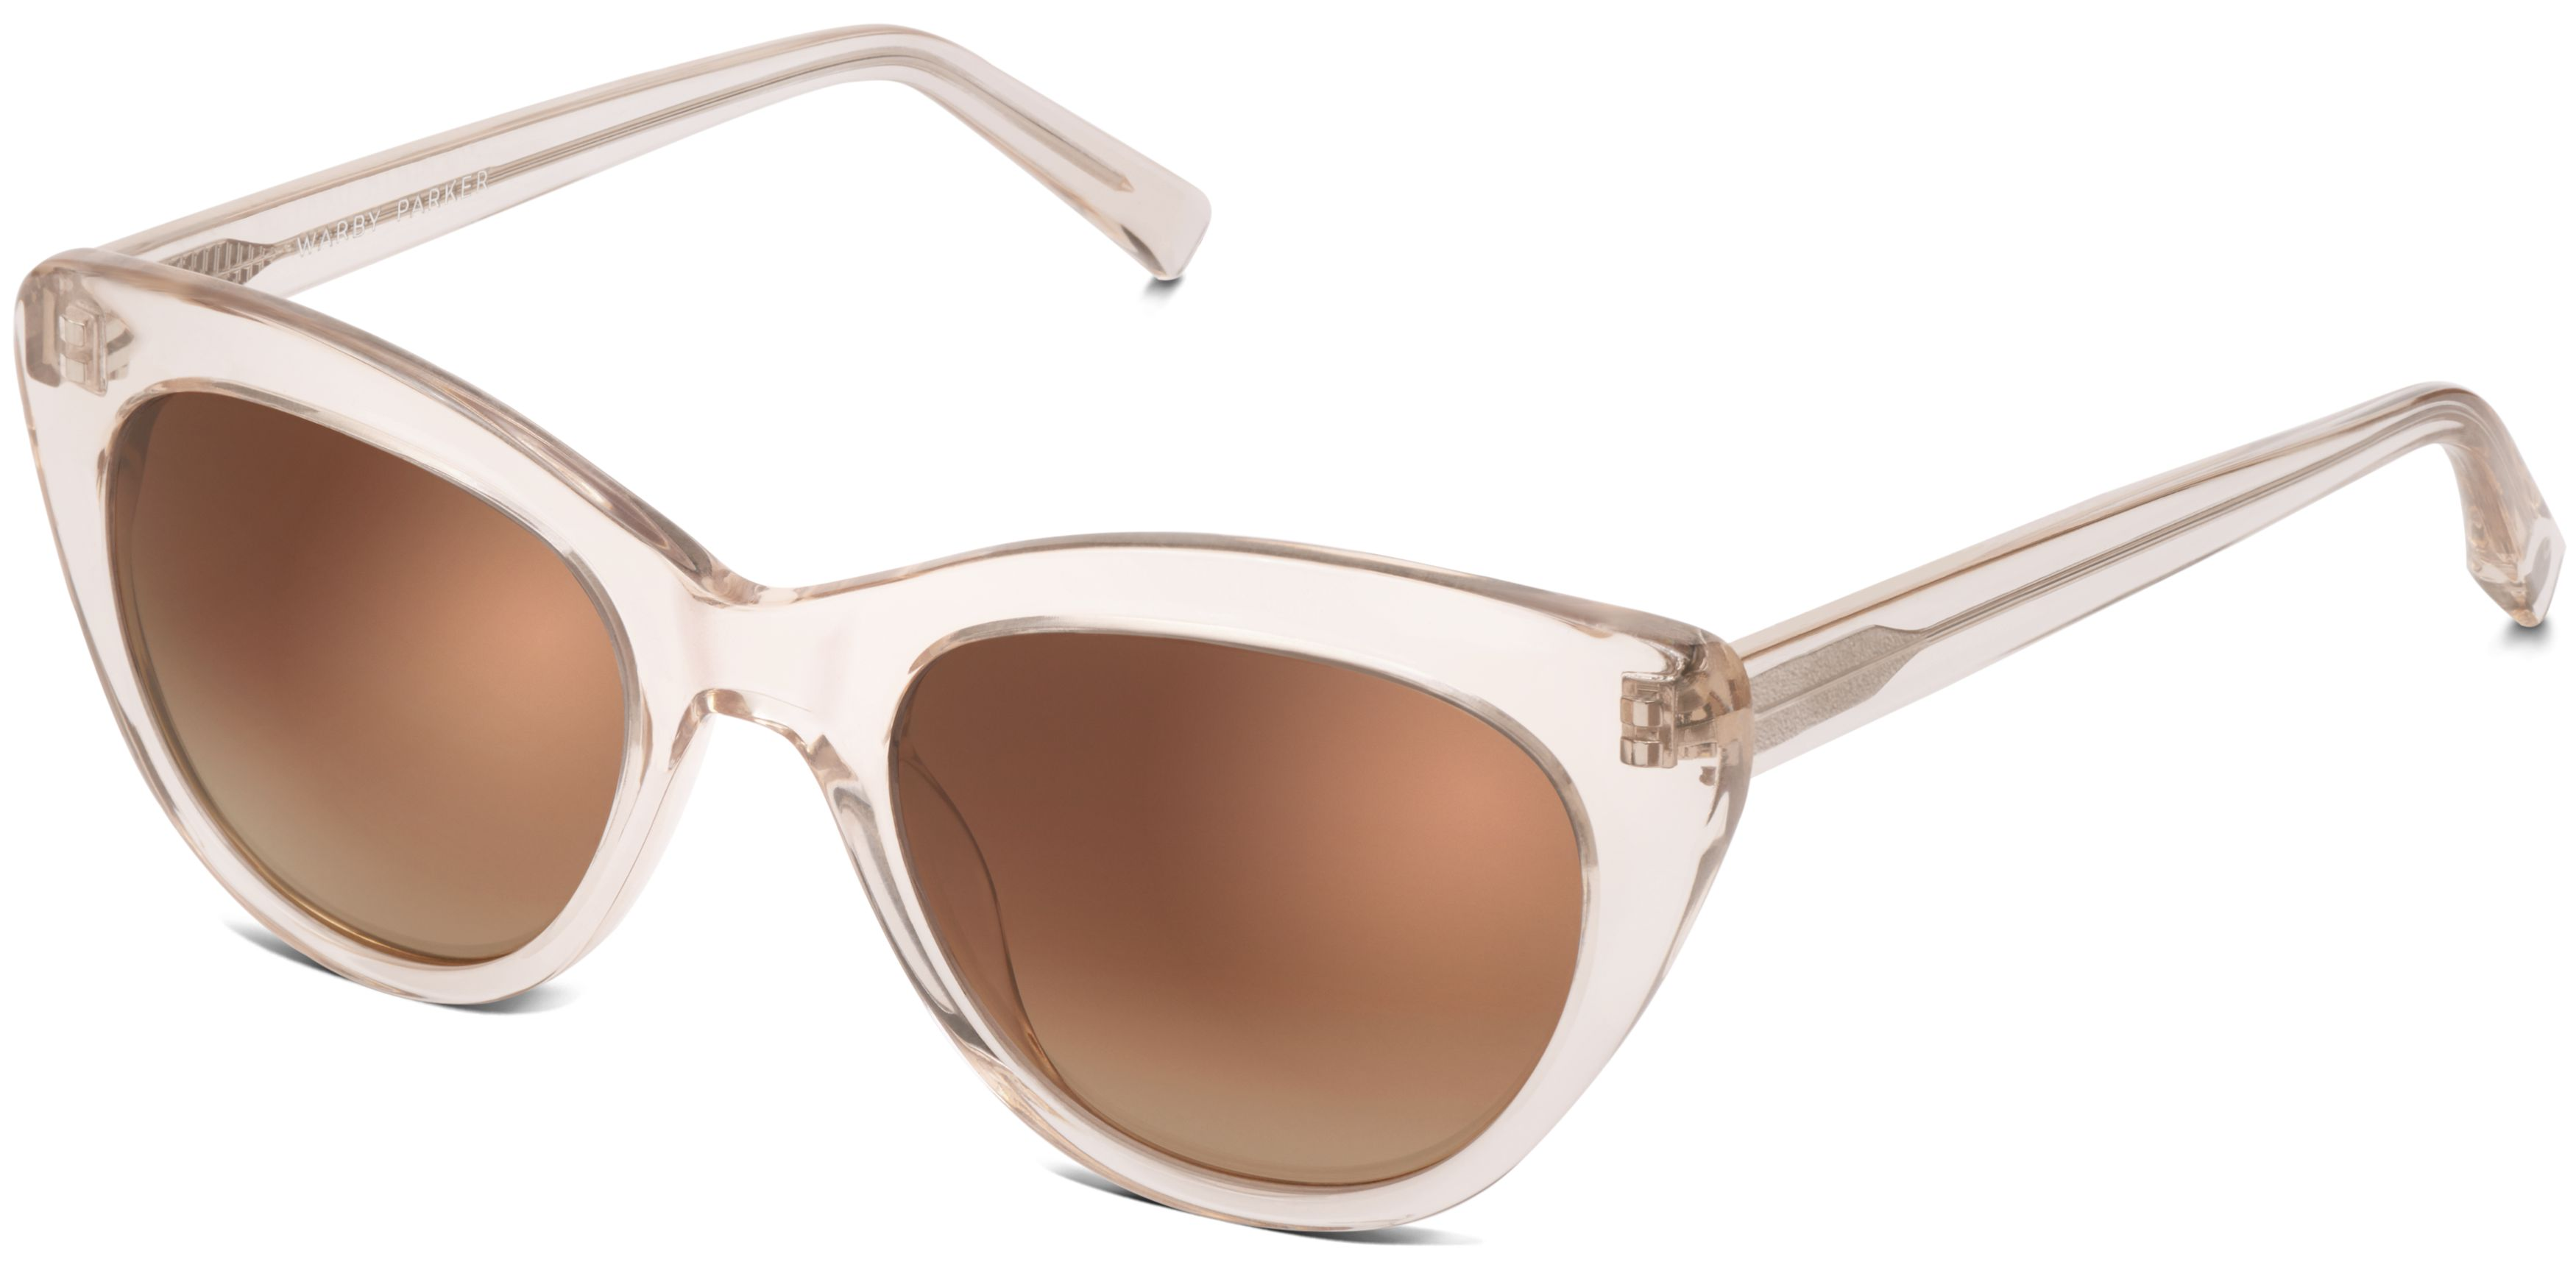 ef11654fac Tilley Sunglasses in Grapefruit Soda with Amber Gradient lenses for Women